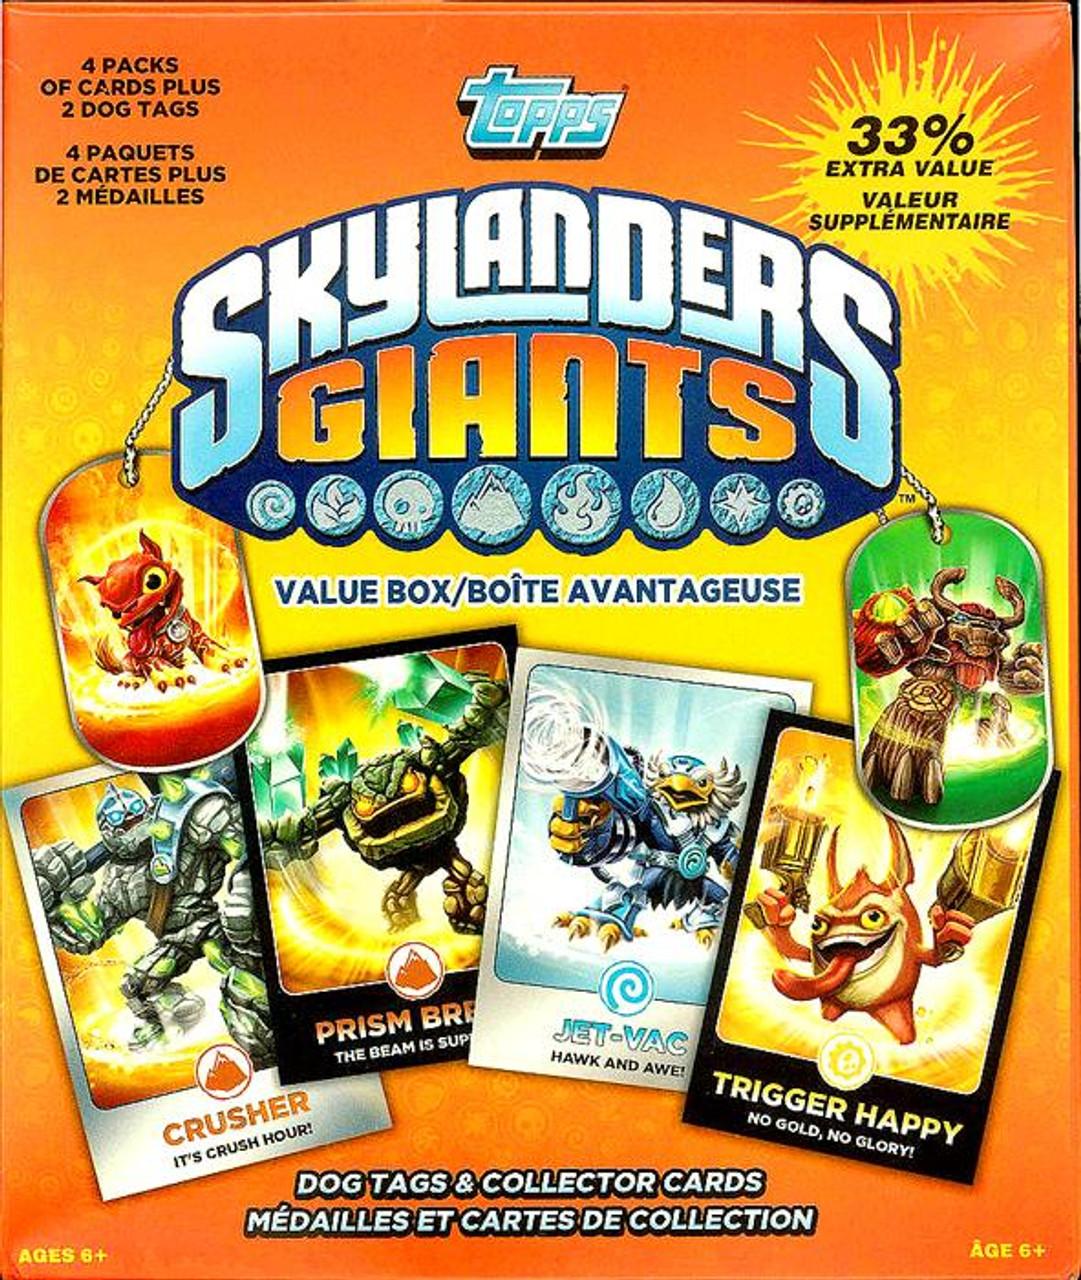 Skylanders Giants Trading Card Value Box